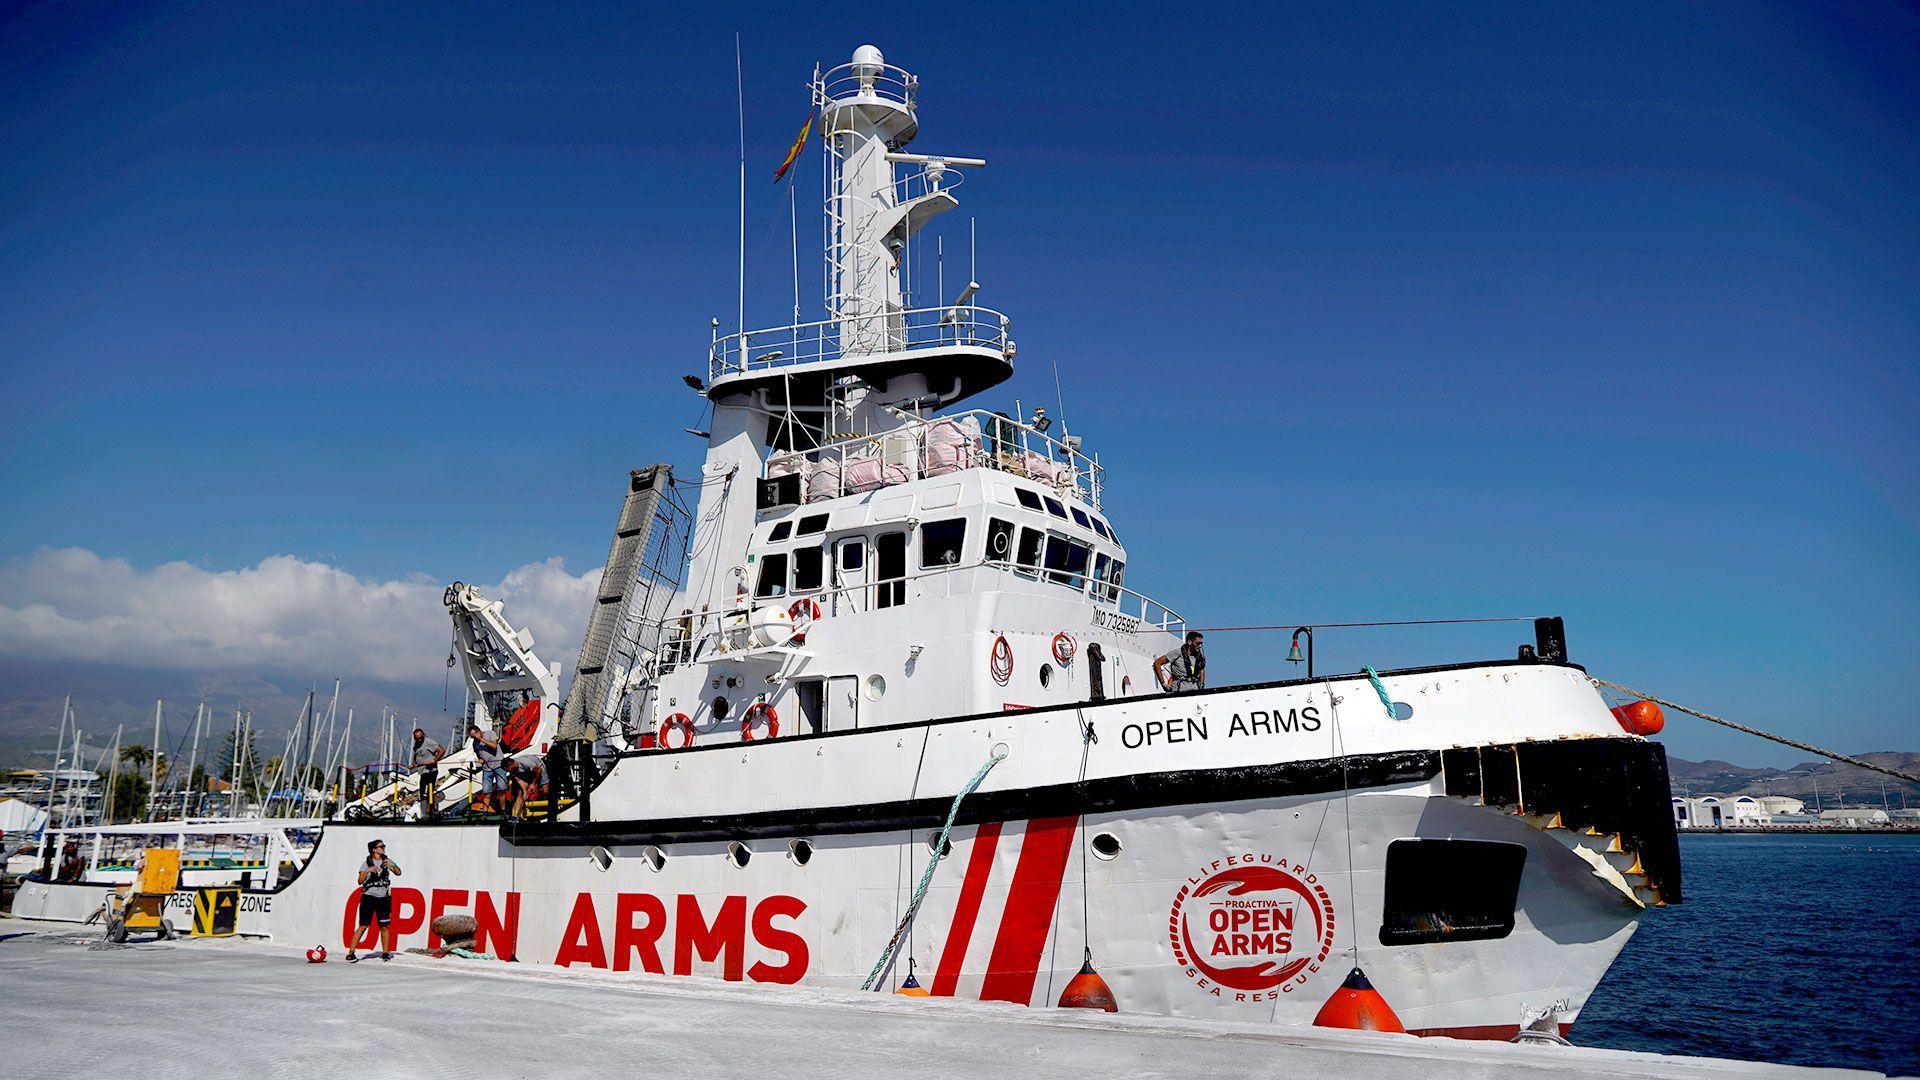 El Open Arms se dirige a Lampedusa con 147 migrantes a bordo (Reuters)